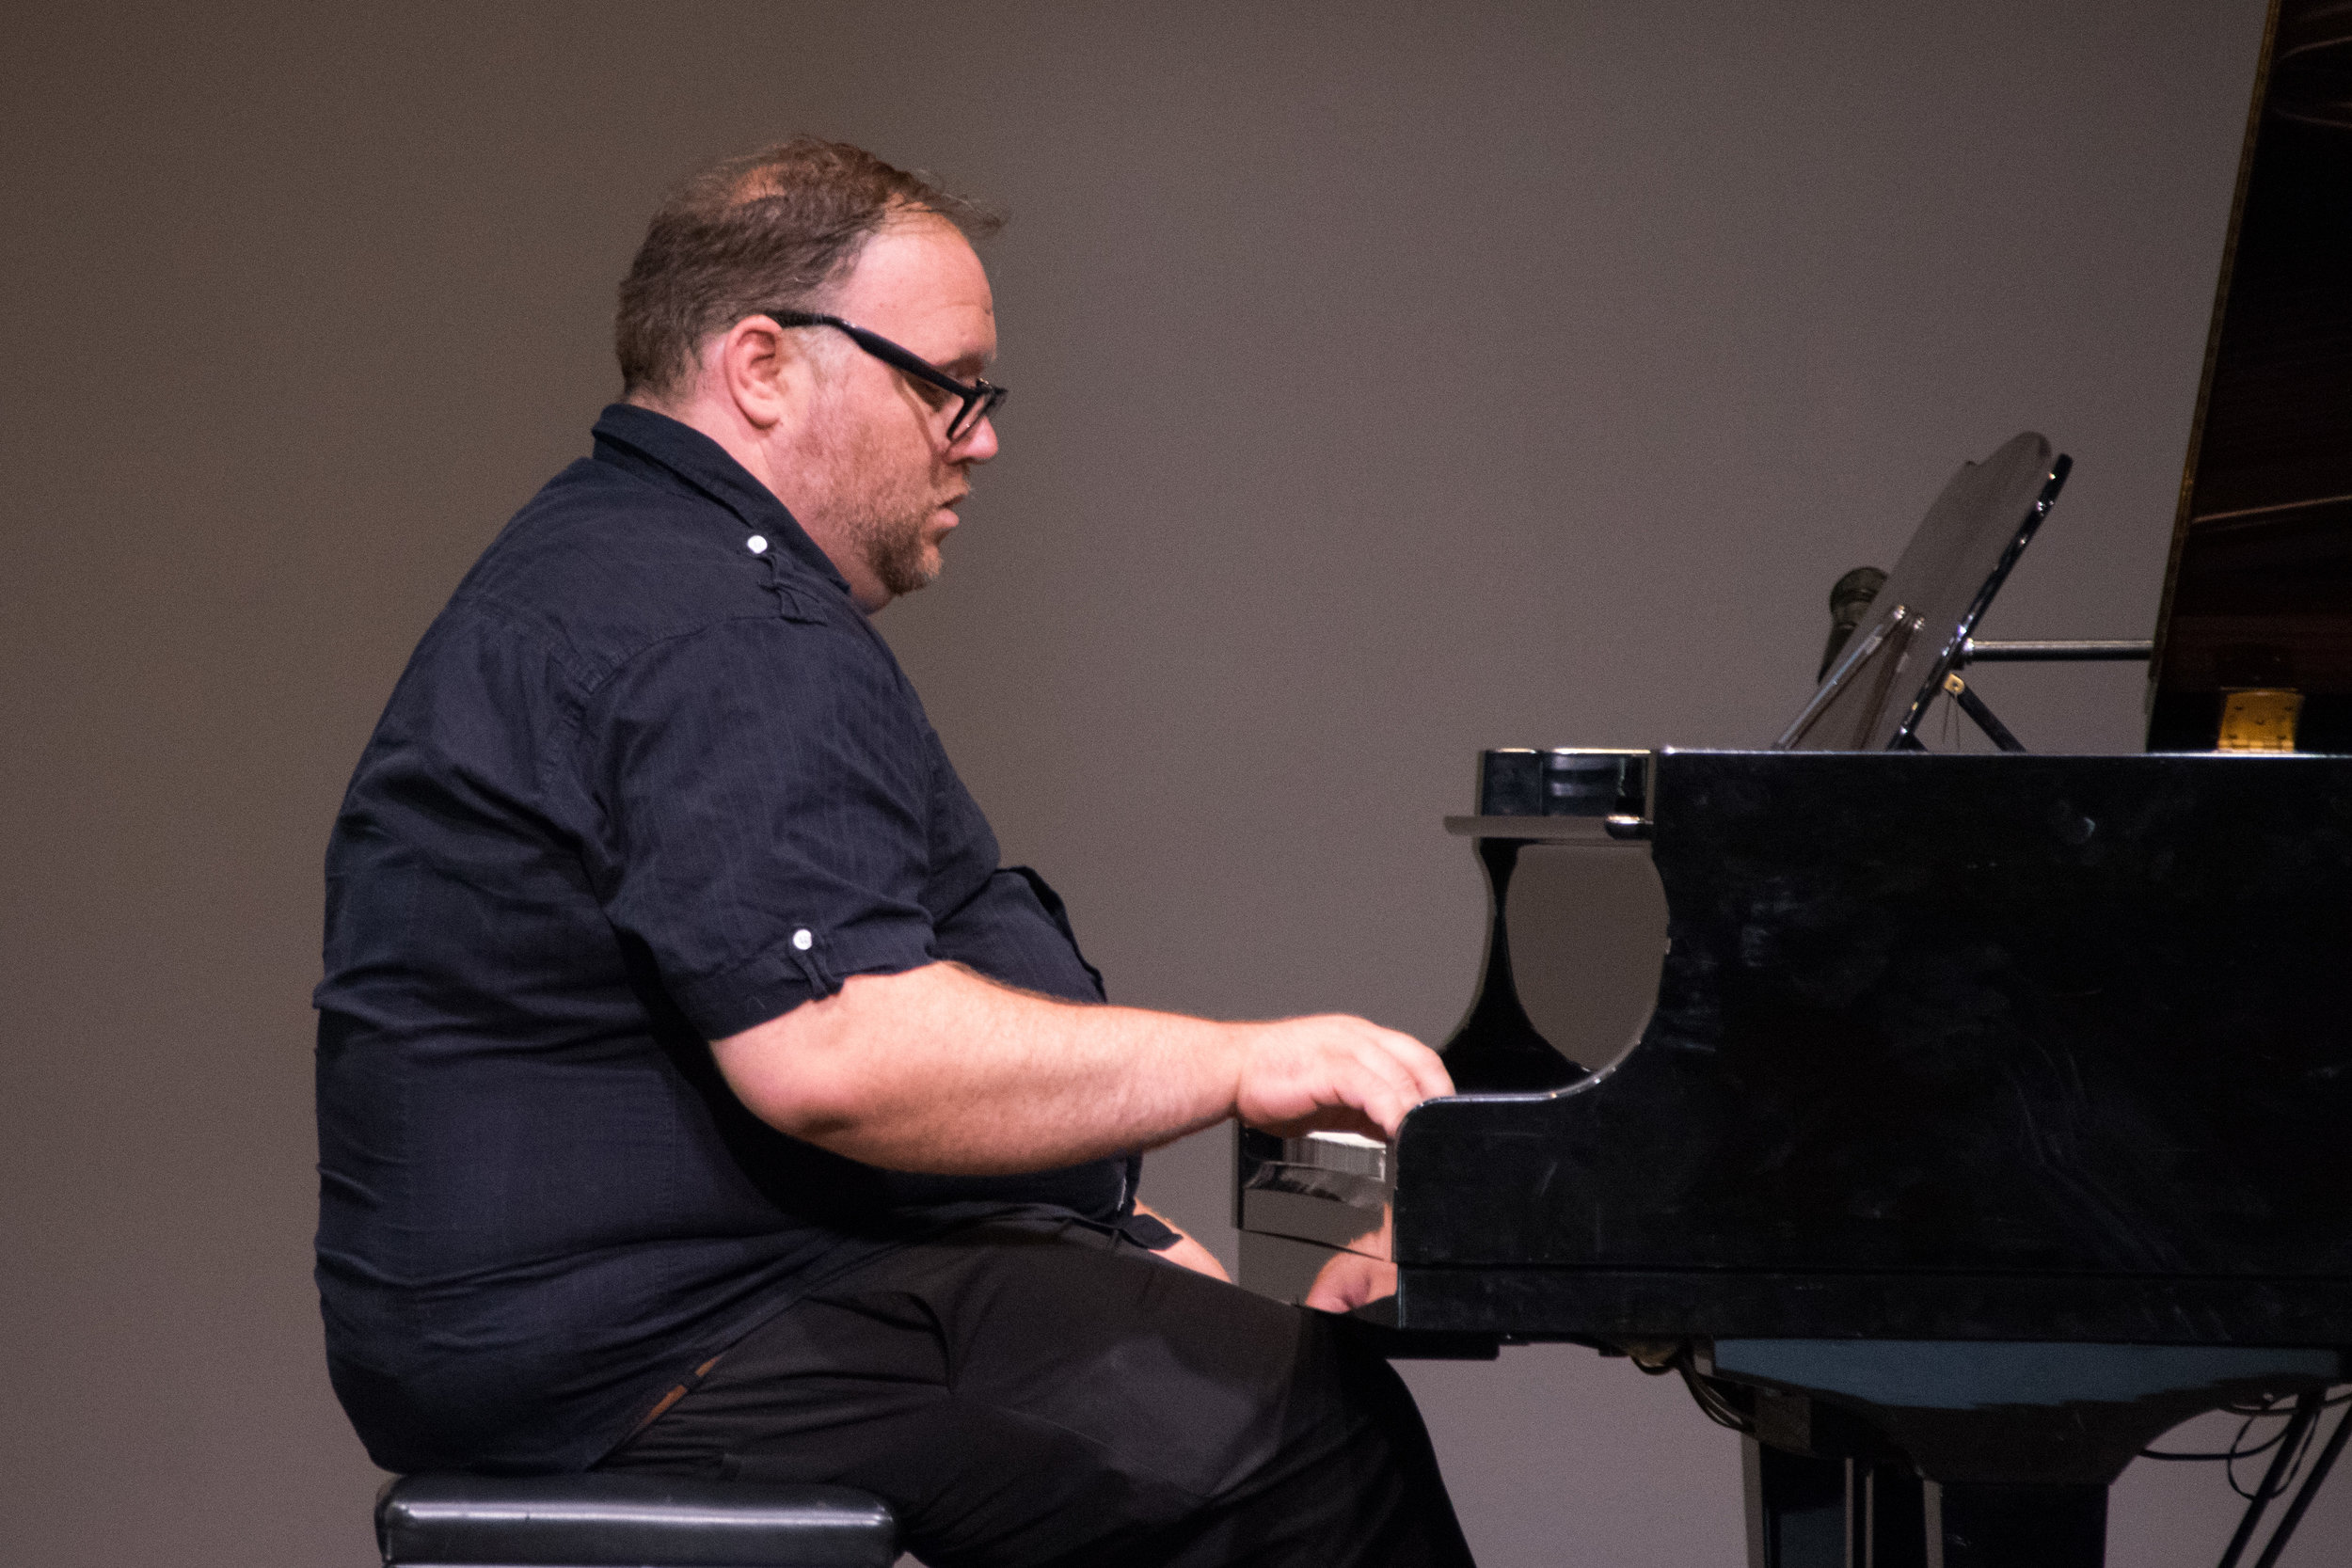 Jason Berman